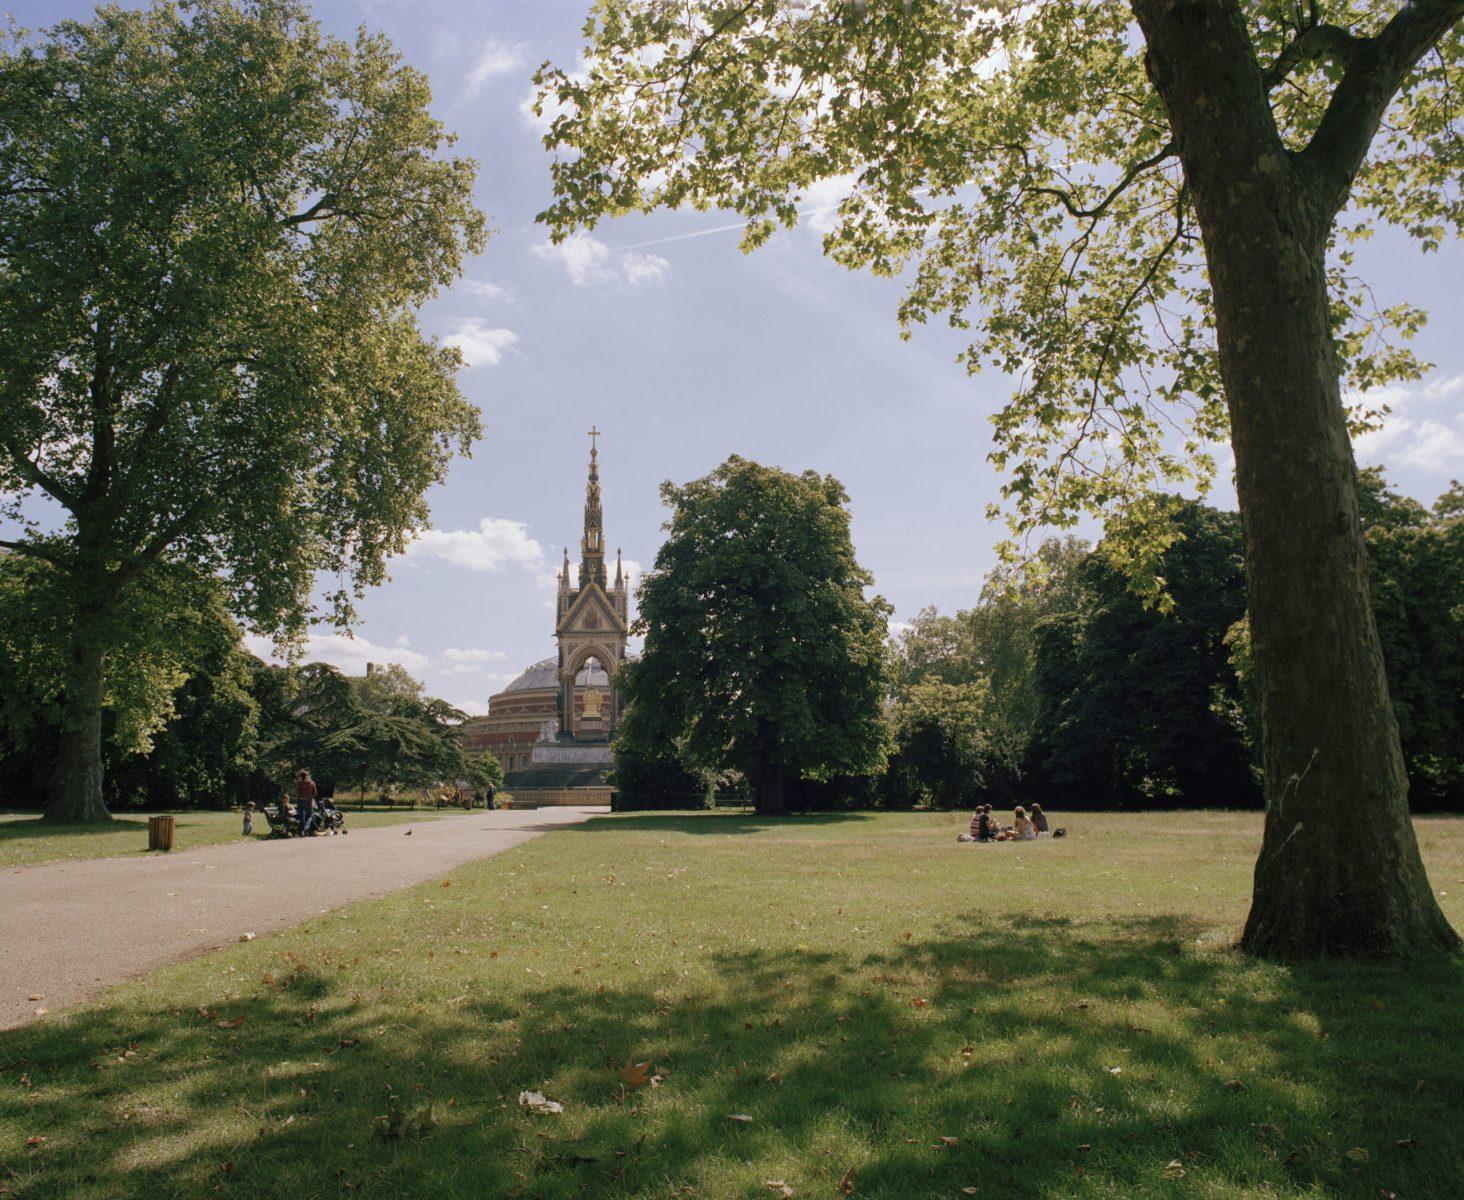 Kensington Gardens